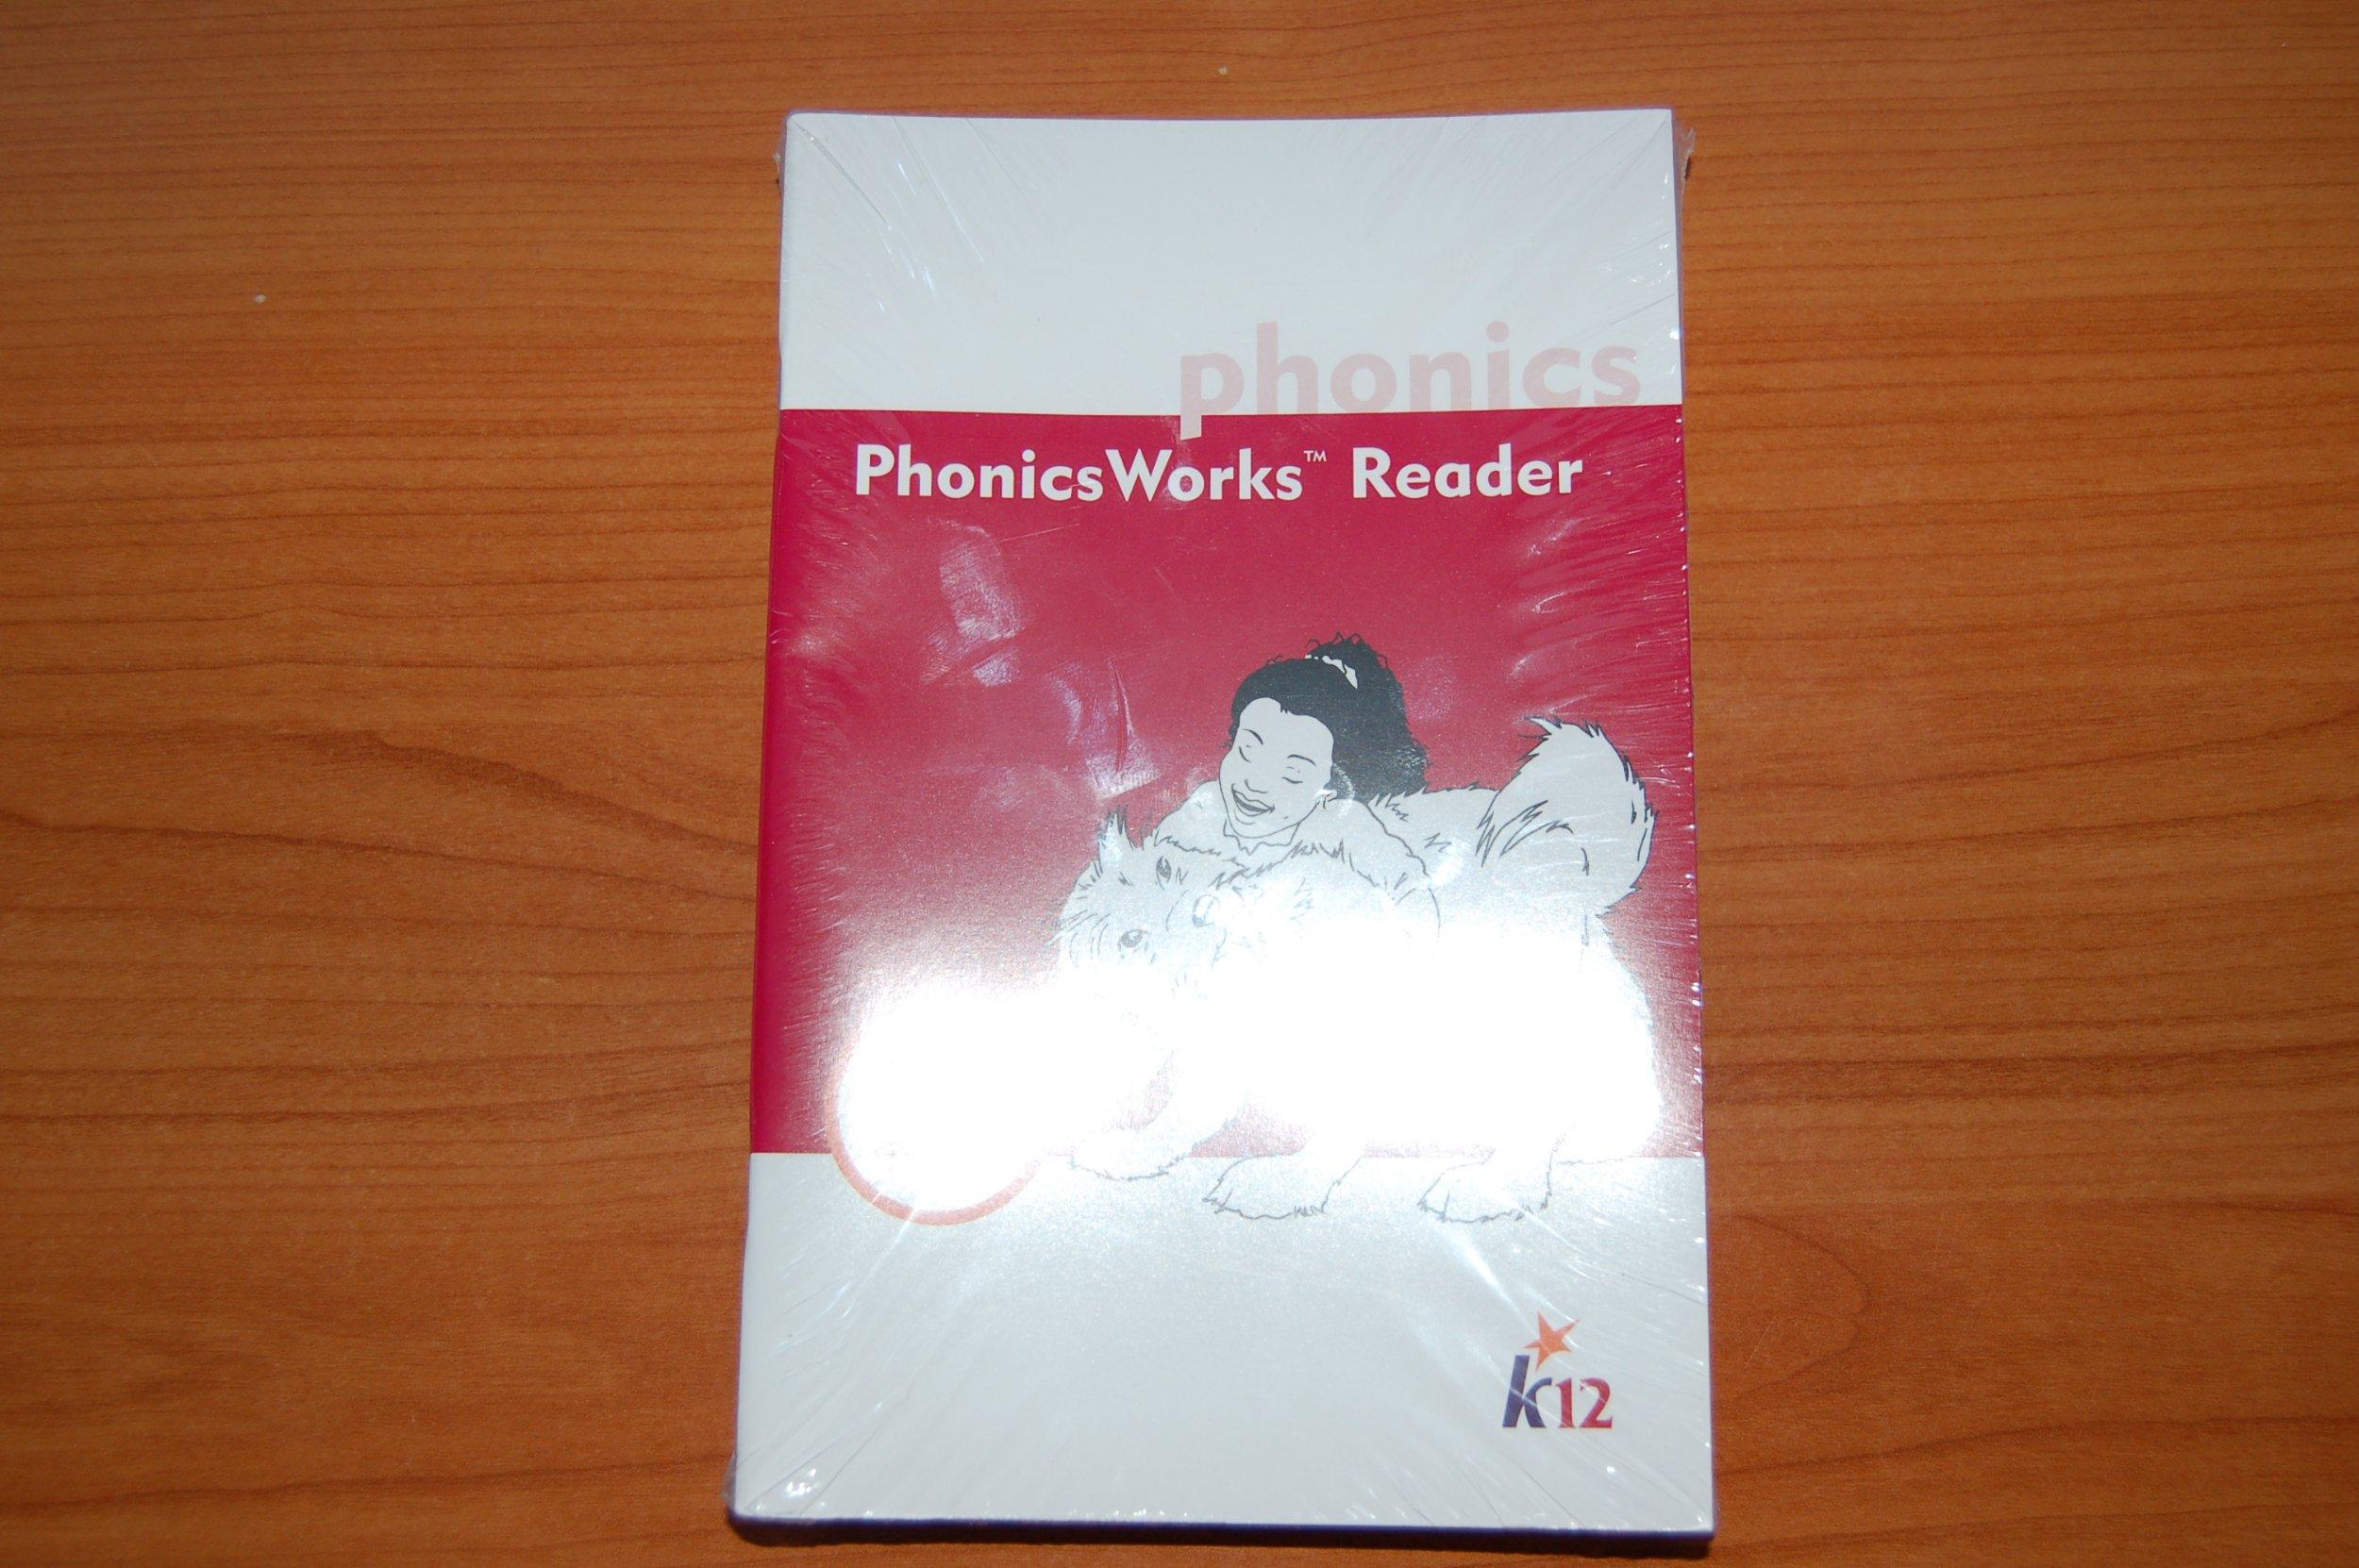 K12 PhonicsWorks Reader: Numbers 21-30 (Ten booklets) pdf epub